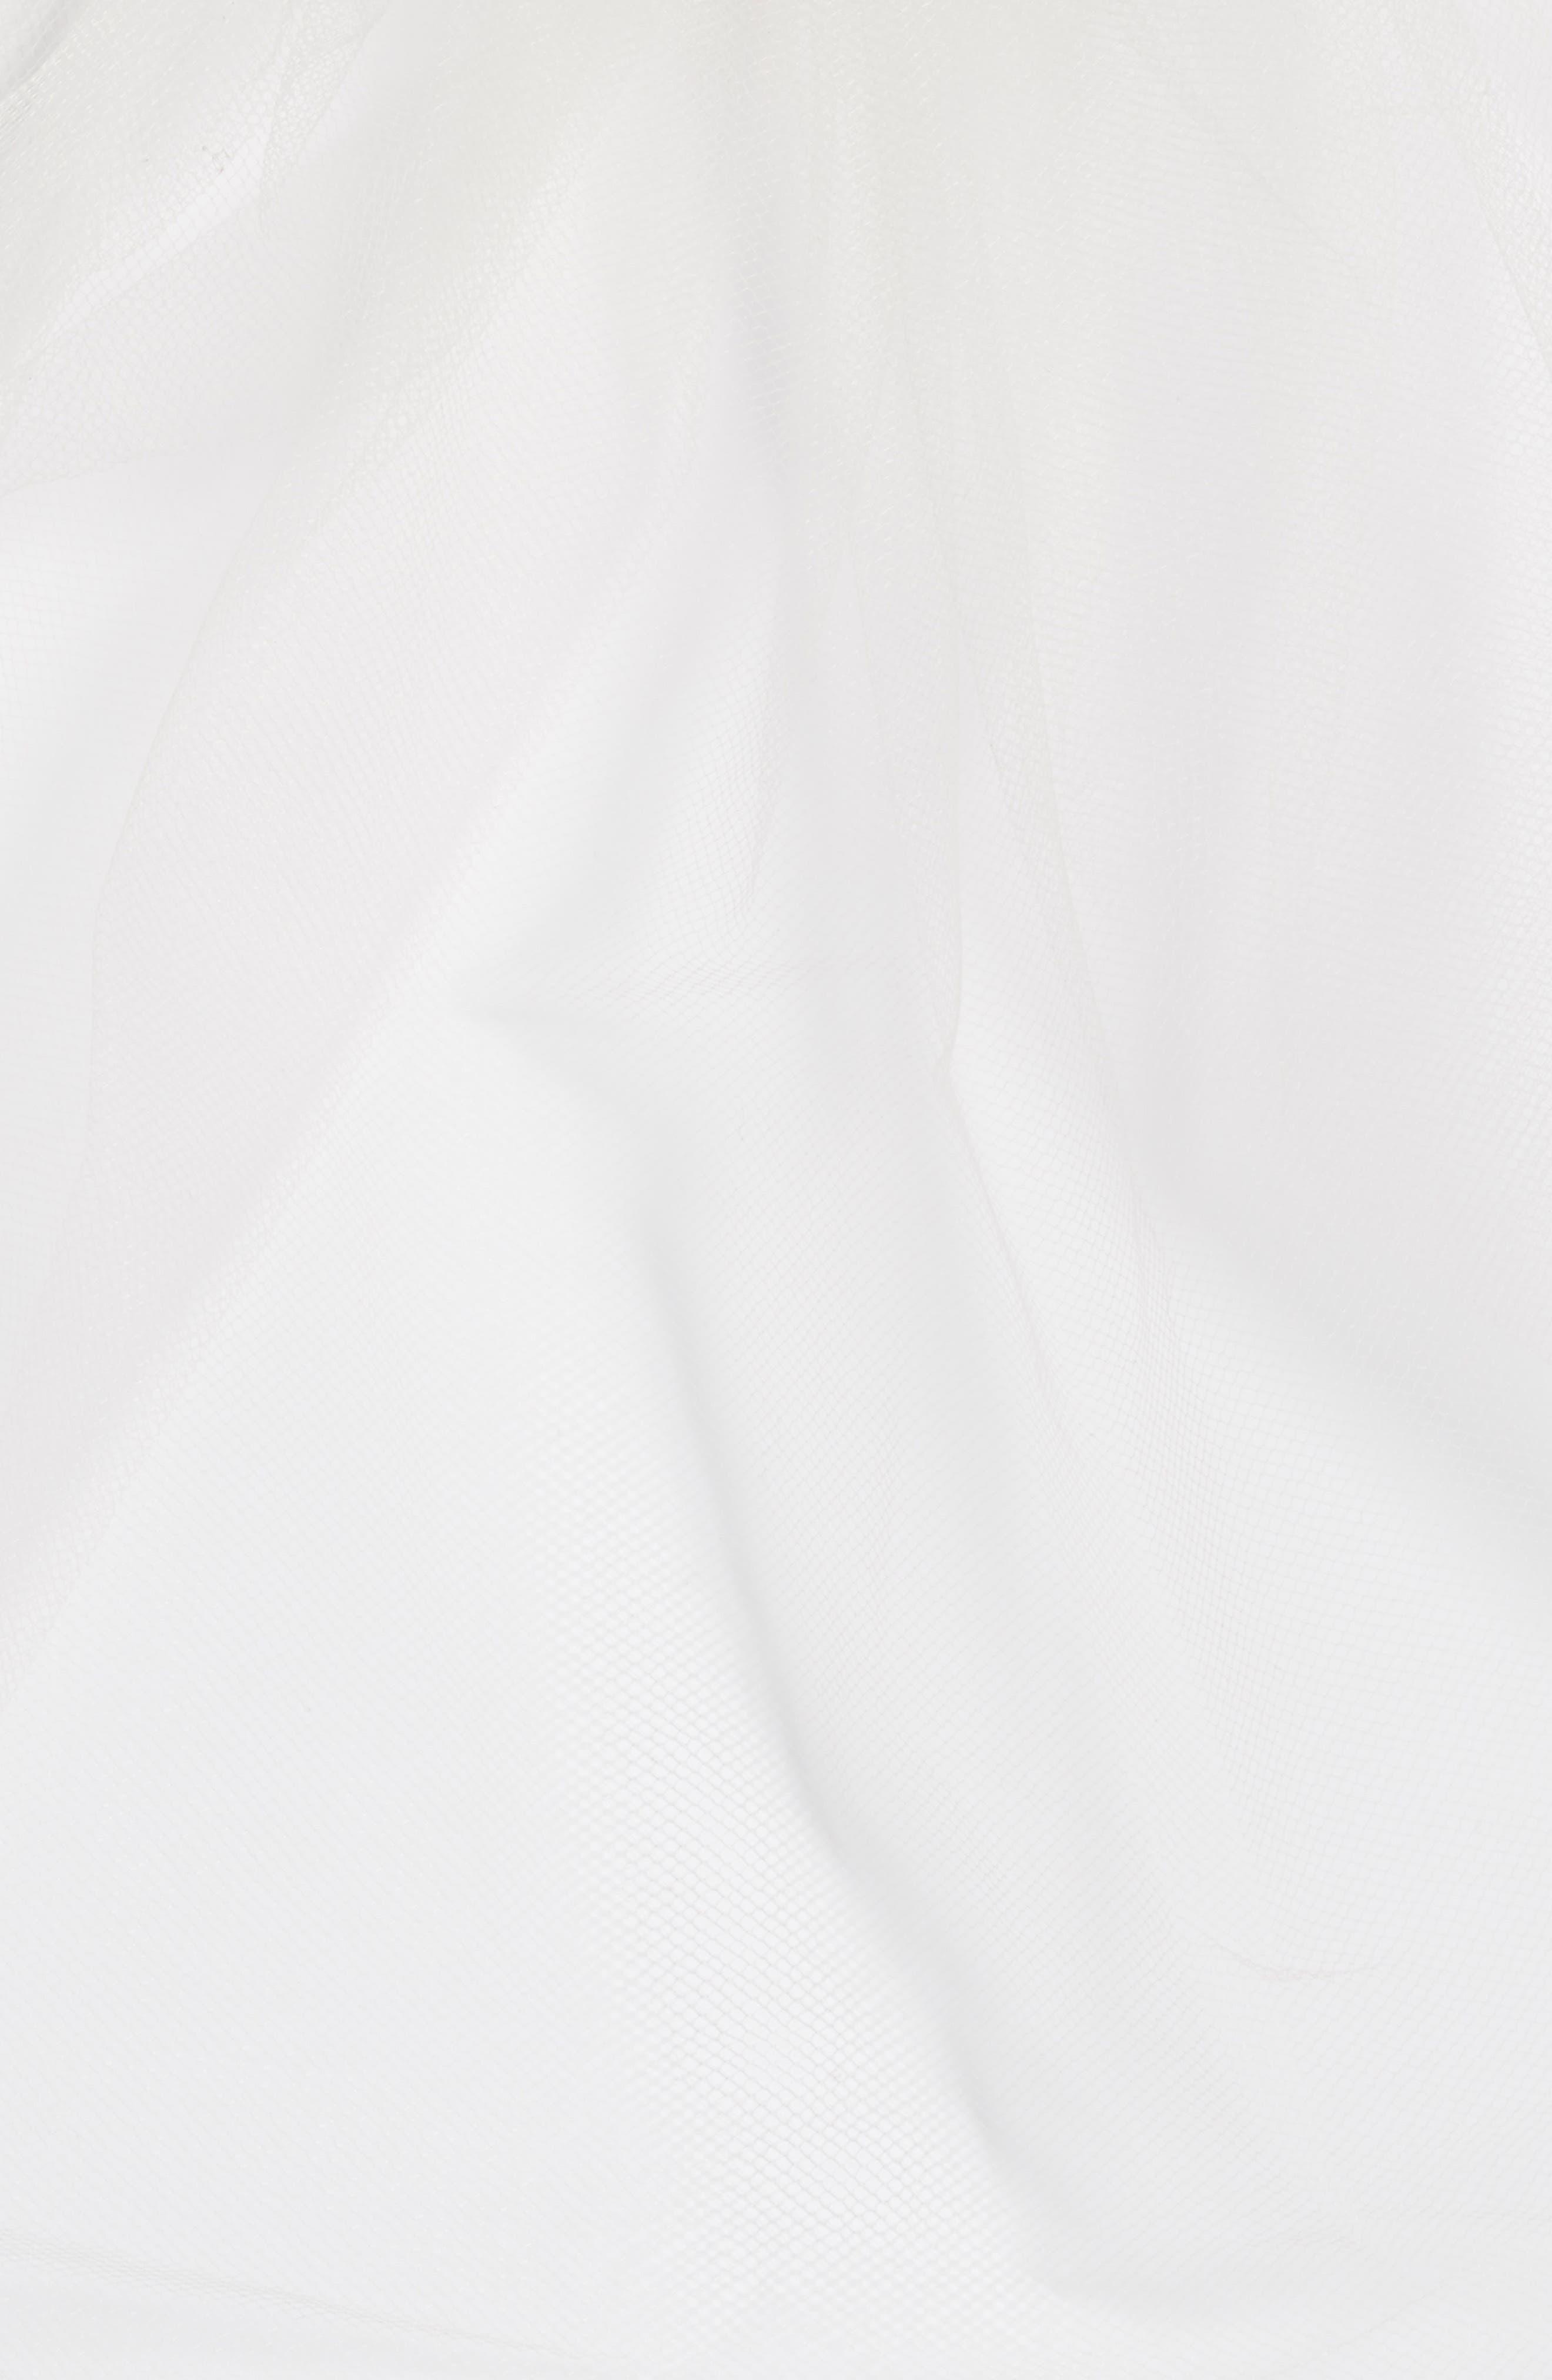 Alternate Image 3  - J-Picone Bridal Veil Hair Comb